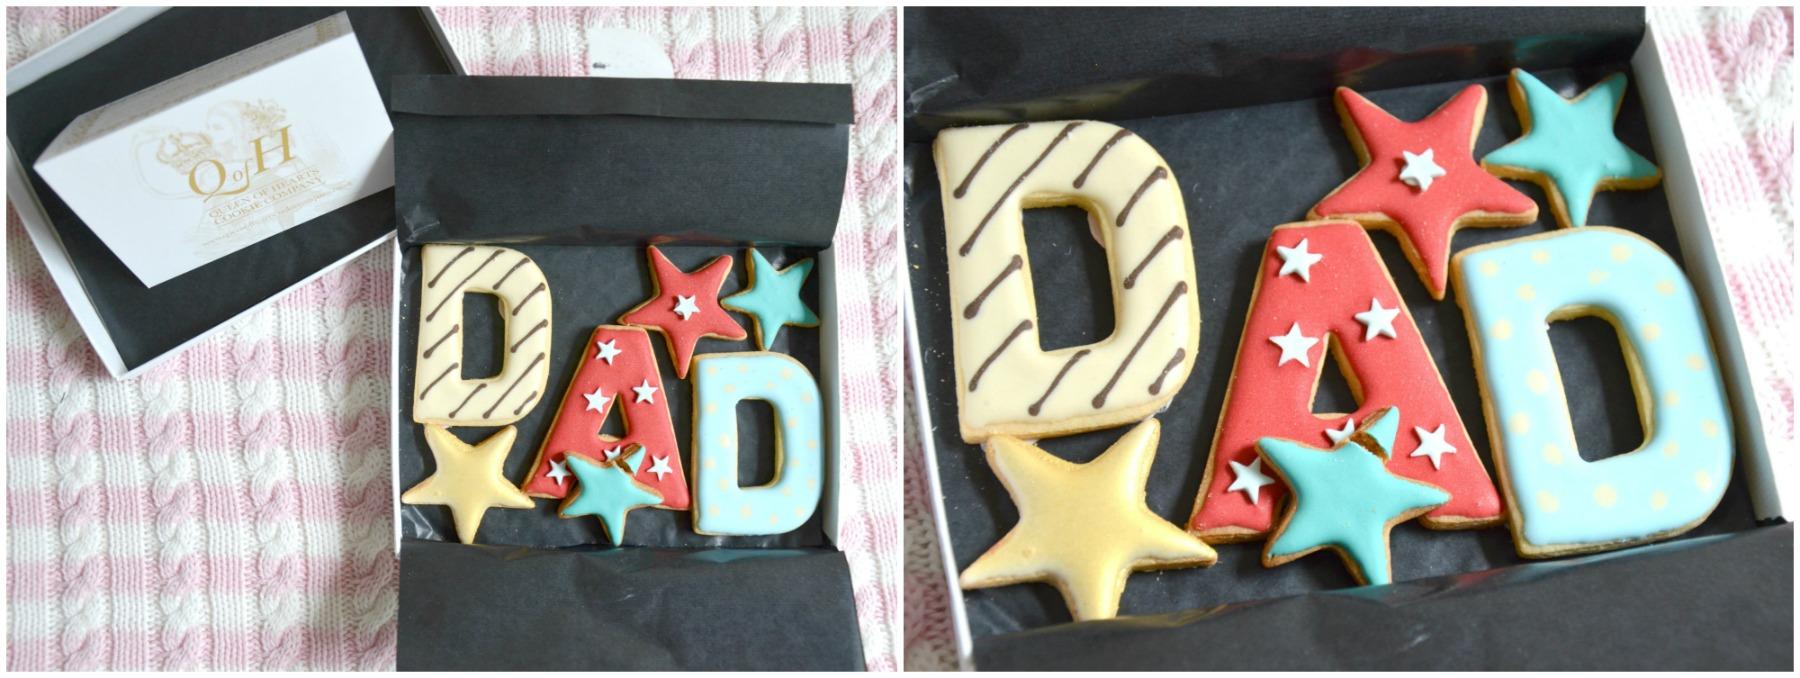 cookies dad